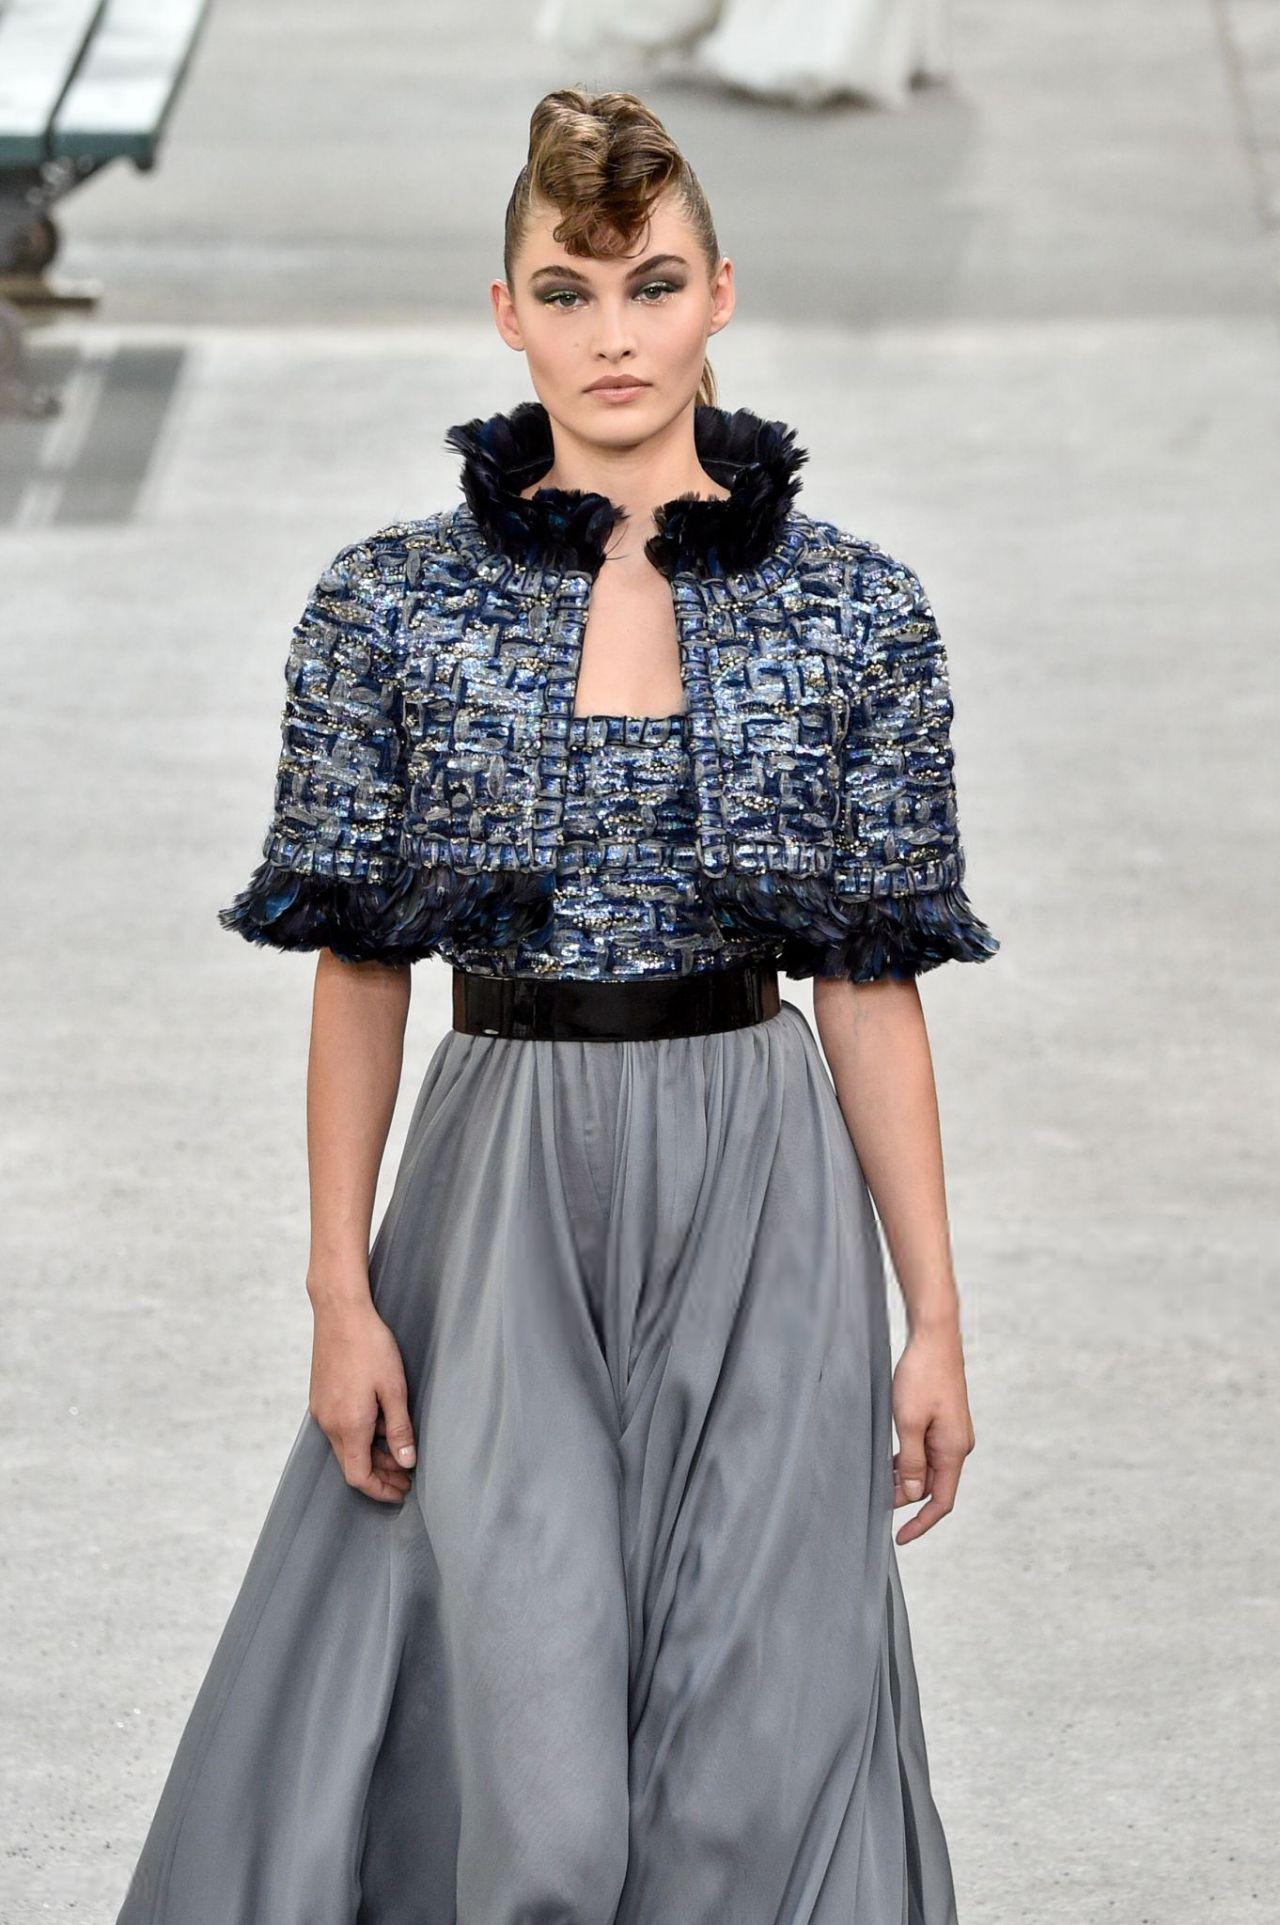 Grace Elizabeth Walking Chanel Haute Couture FW 2018/2019